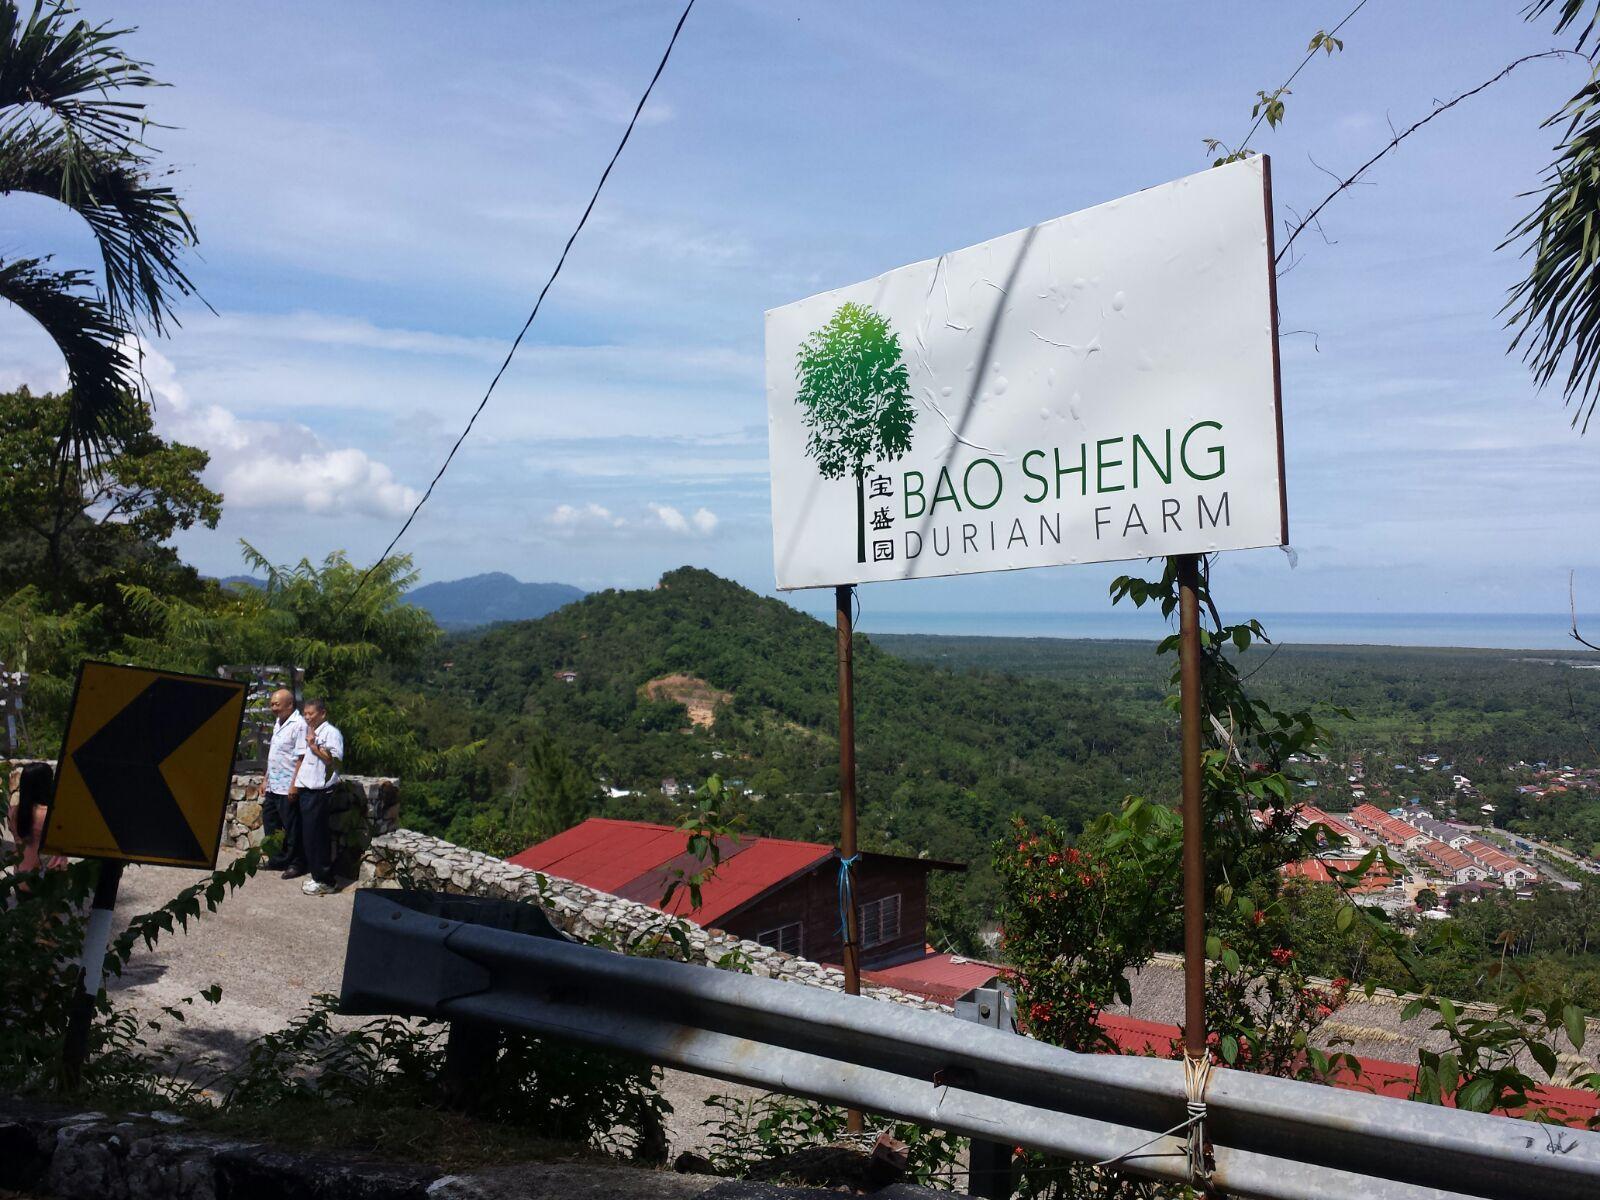 Hasil gambar untuk Bao Sheng Durian Farm